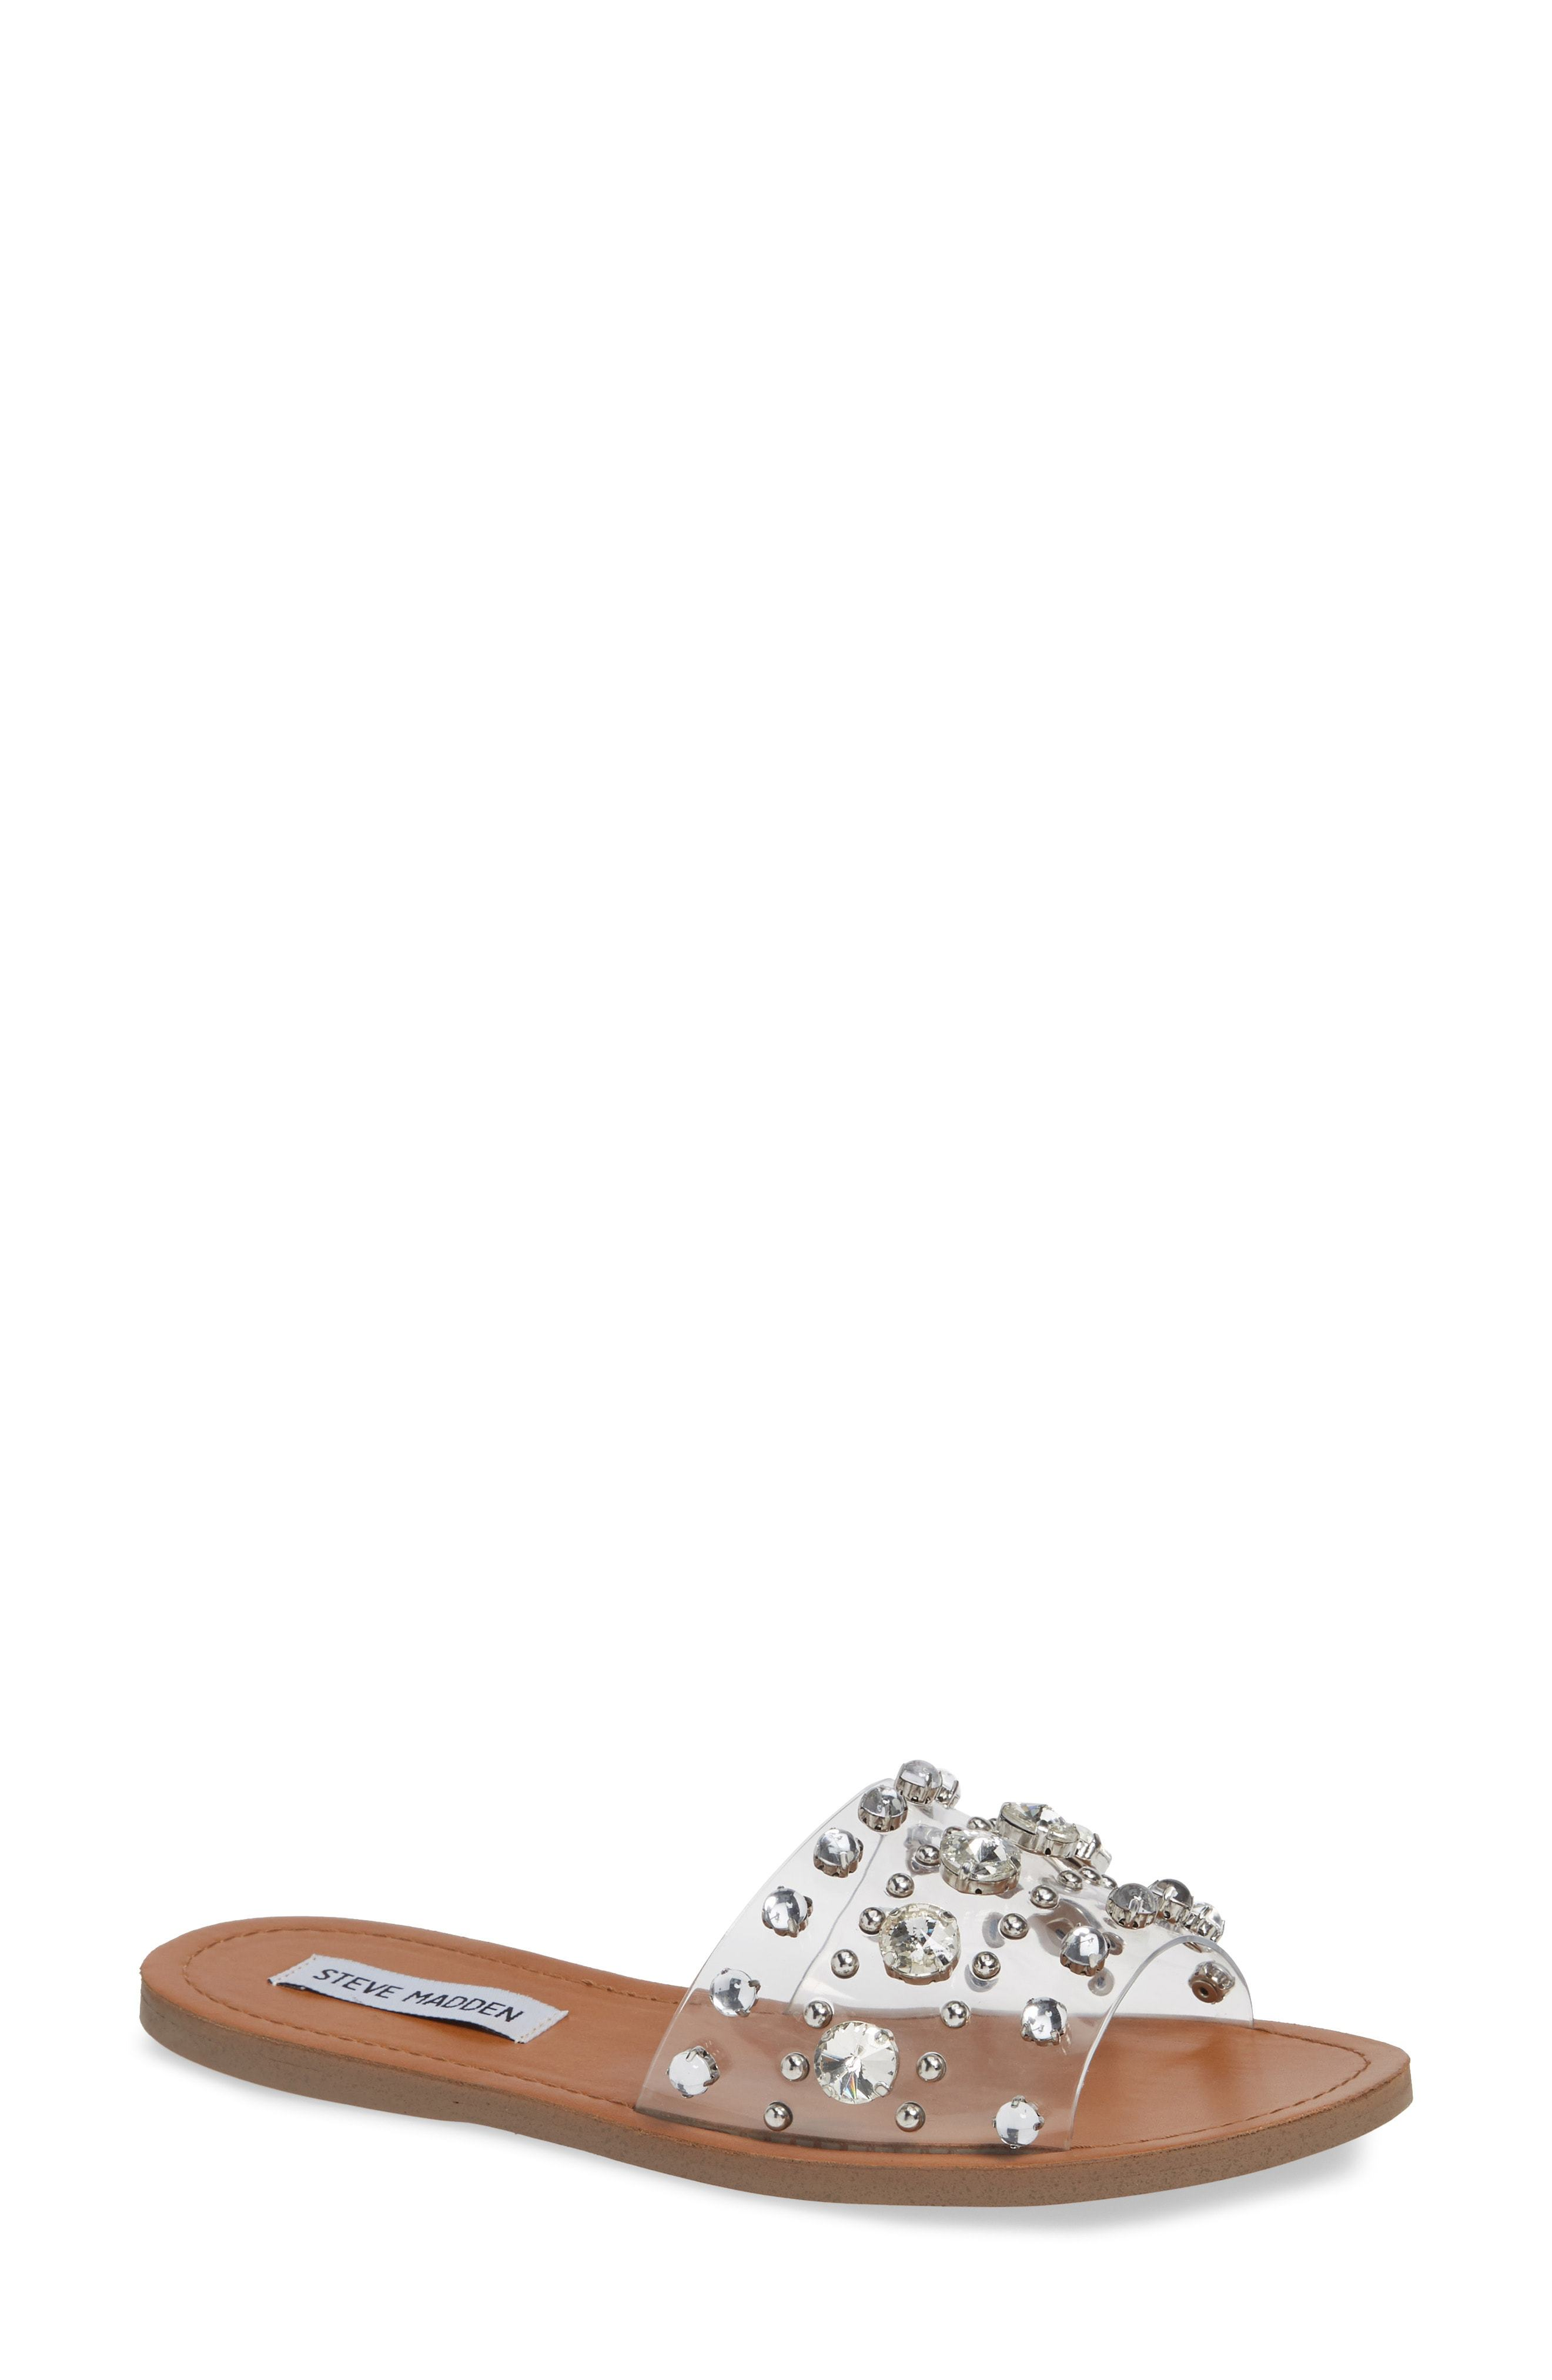 4e3f23f52bb ... Steve Madden Regent Embellished Slide Sandal